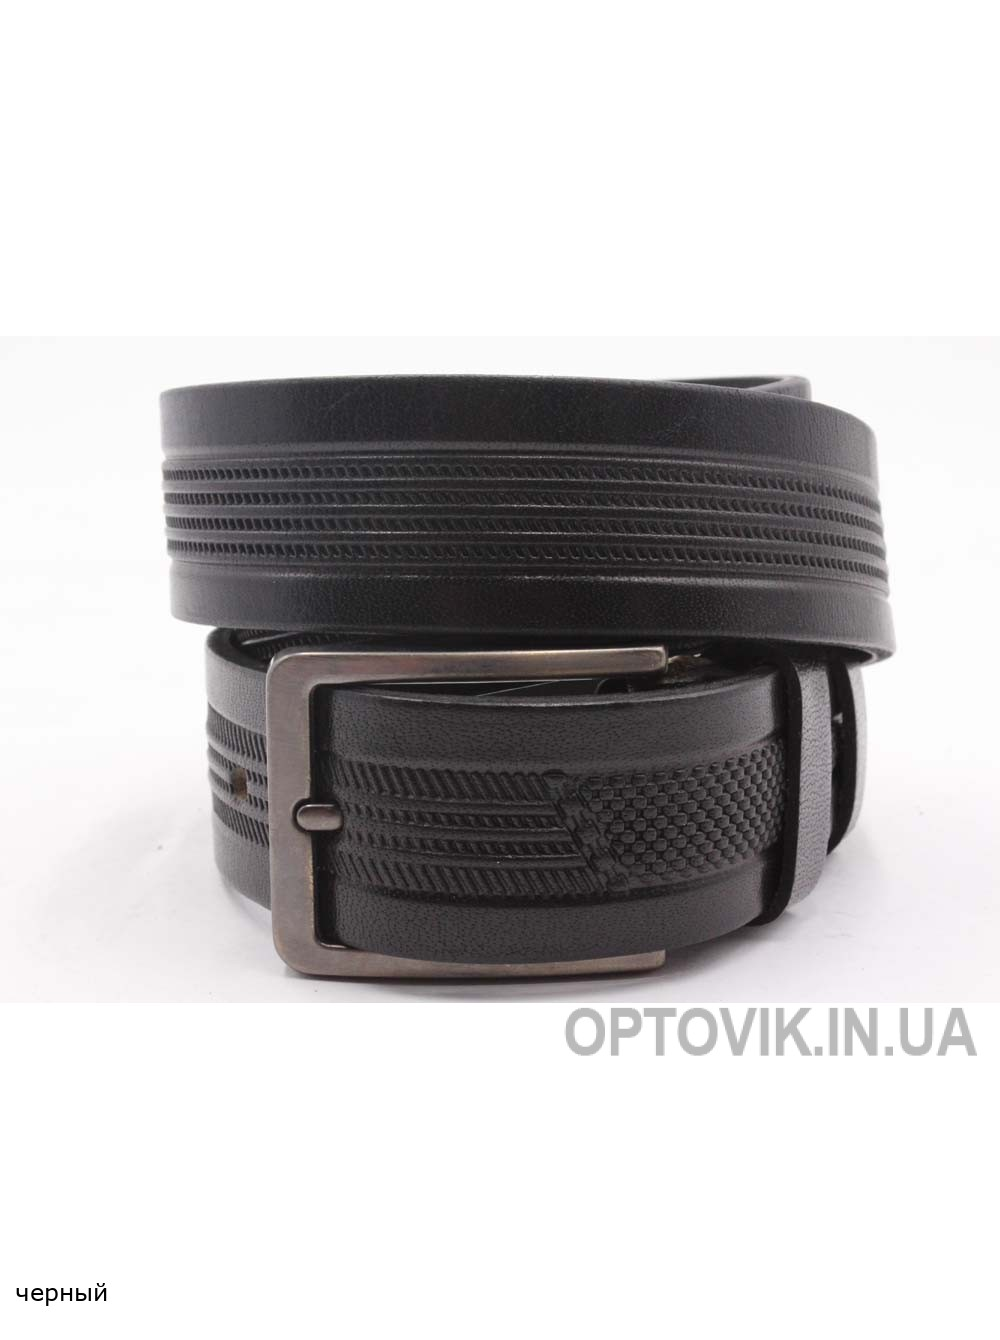 Ремень кожа 35 Real Leather - 1rl116157